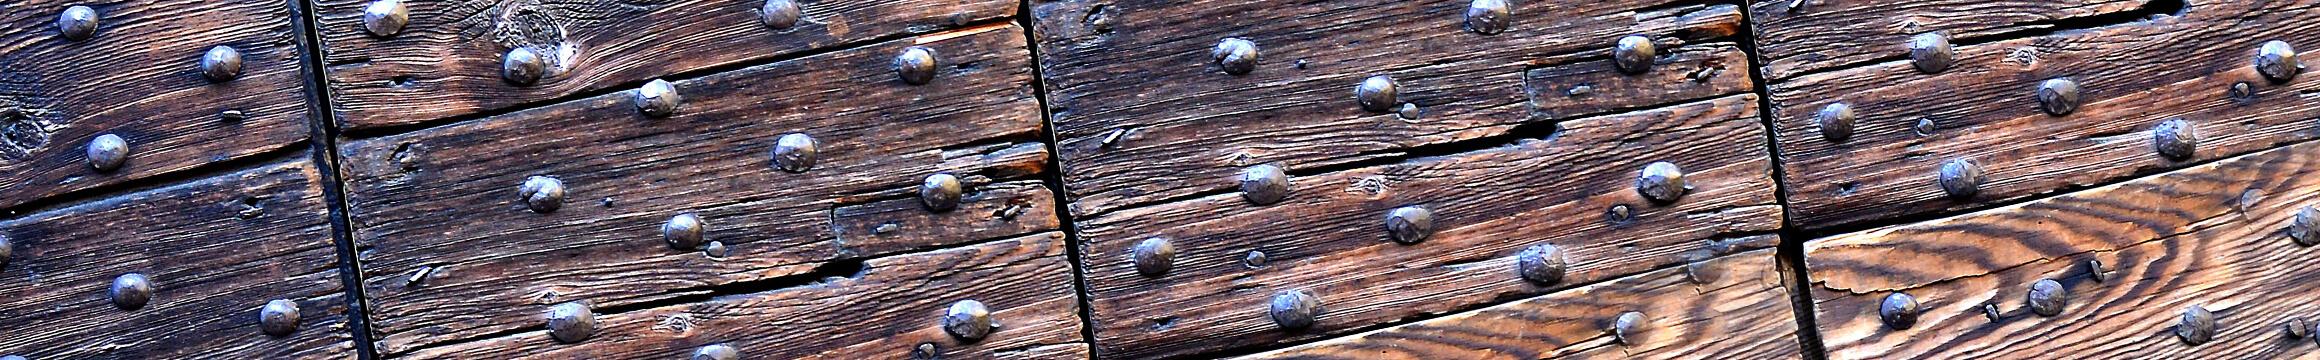 Wood Rustic 01